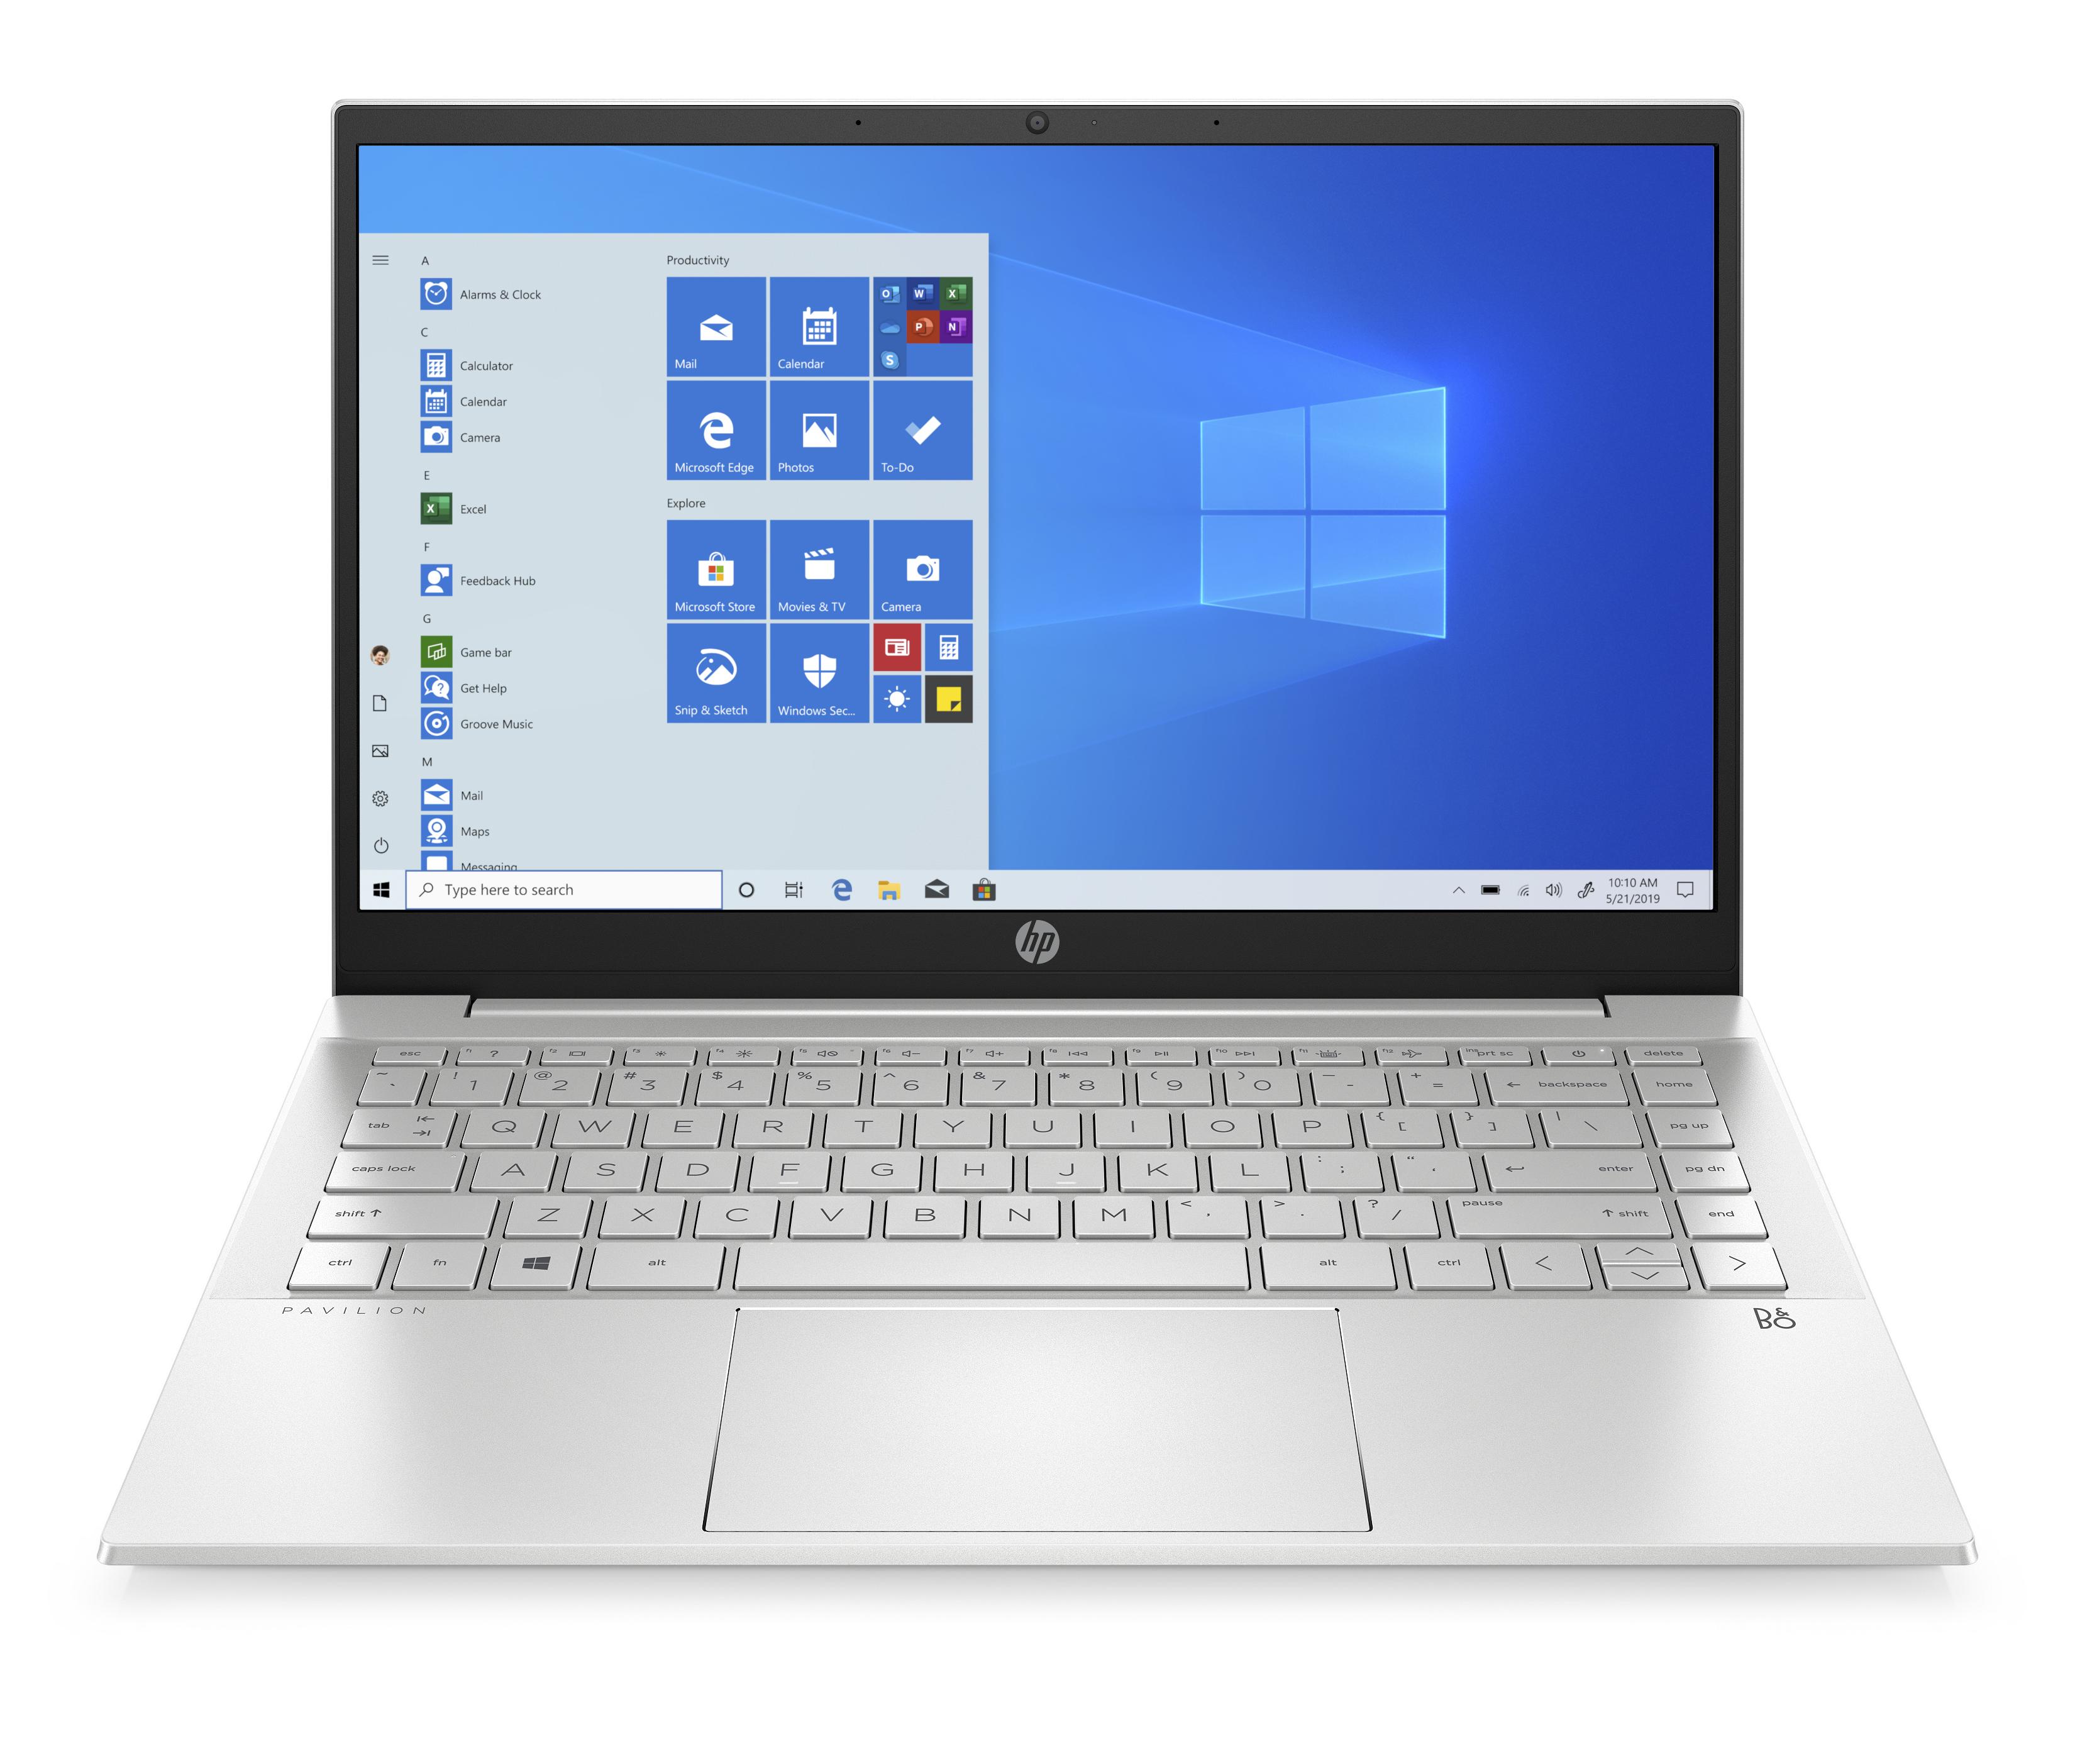 HP Pavilion Laptop 14-dv0043nf